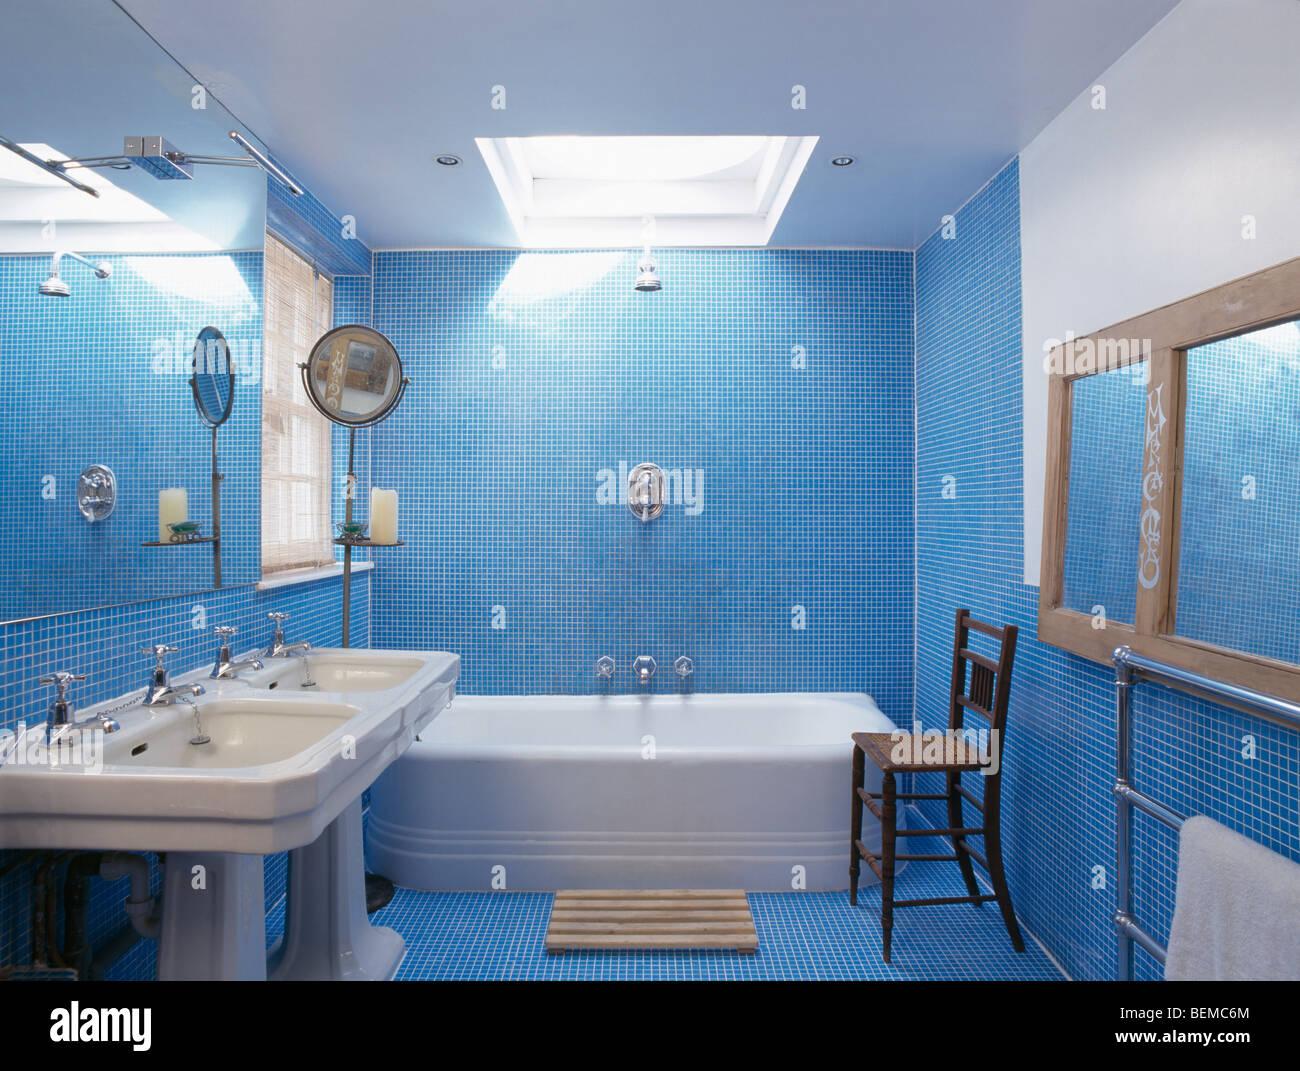 Double white basins in modern blue mosaic tiled bathroom with bath ...